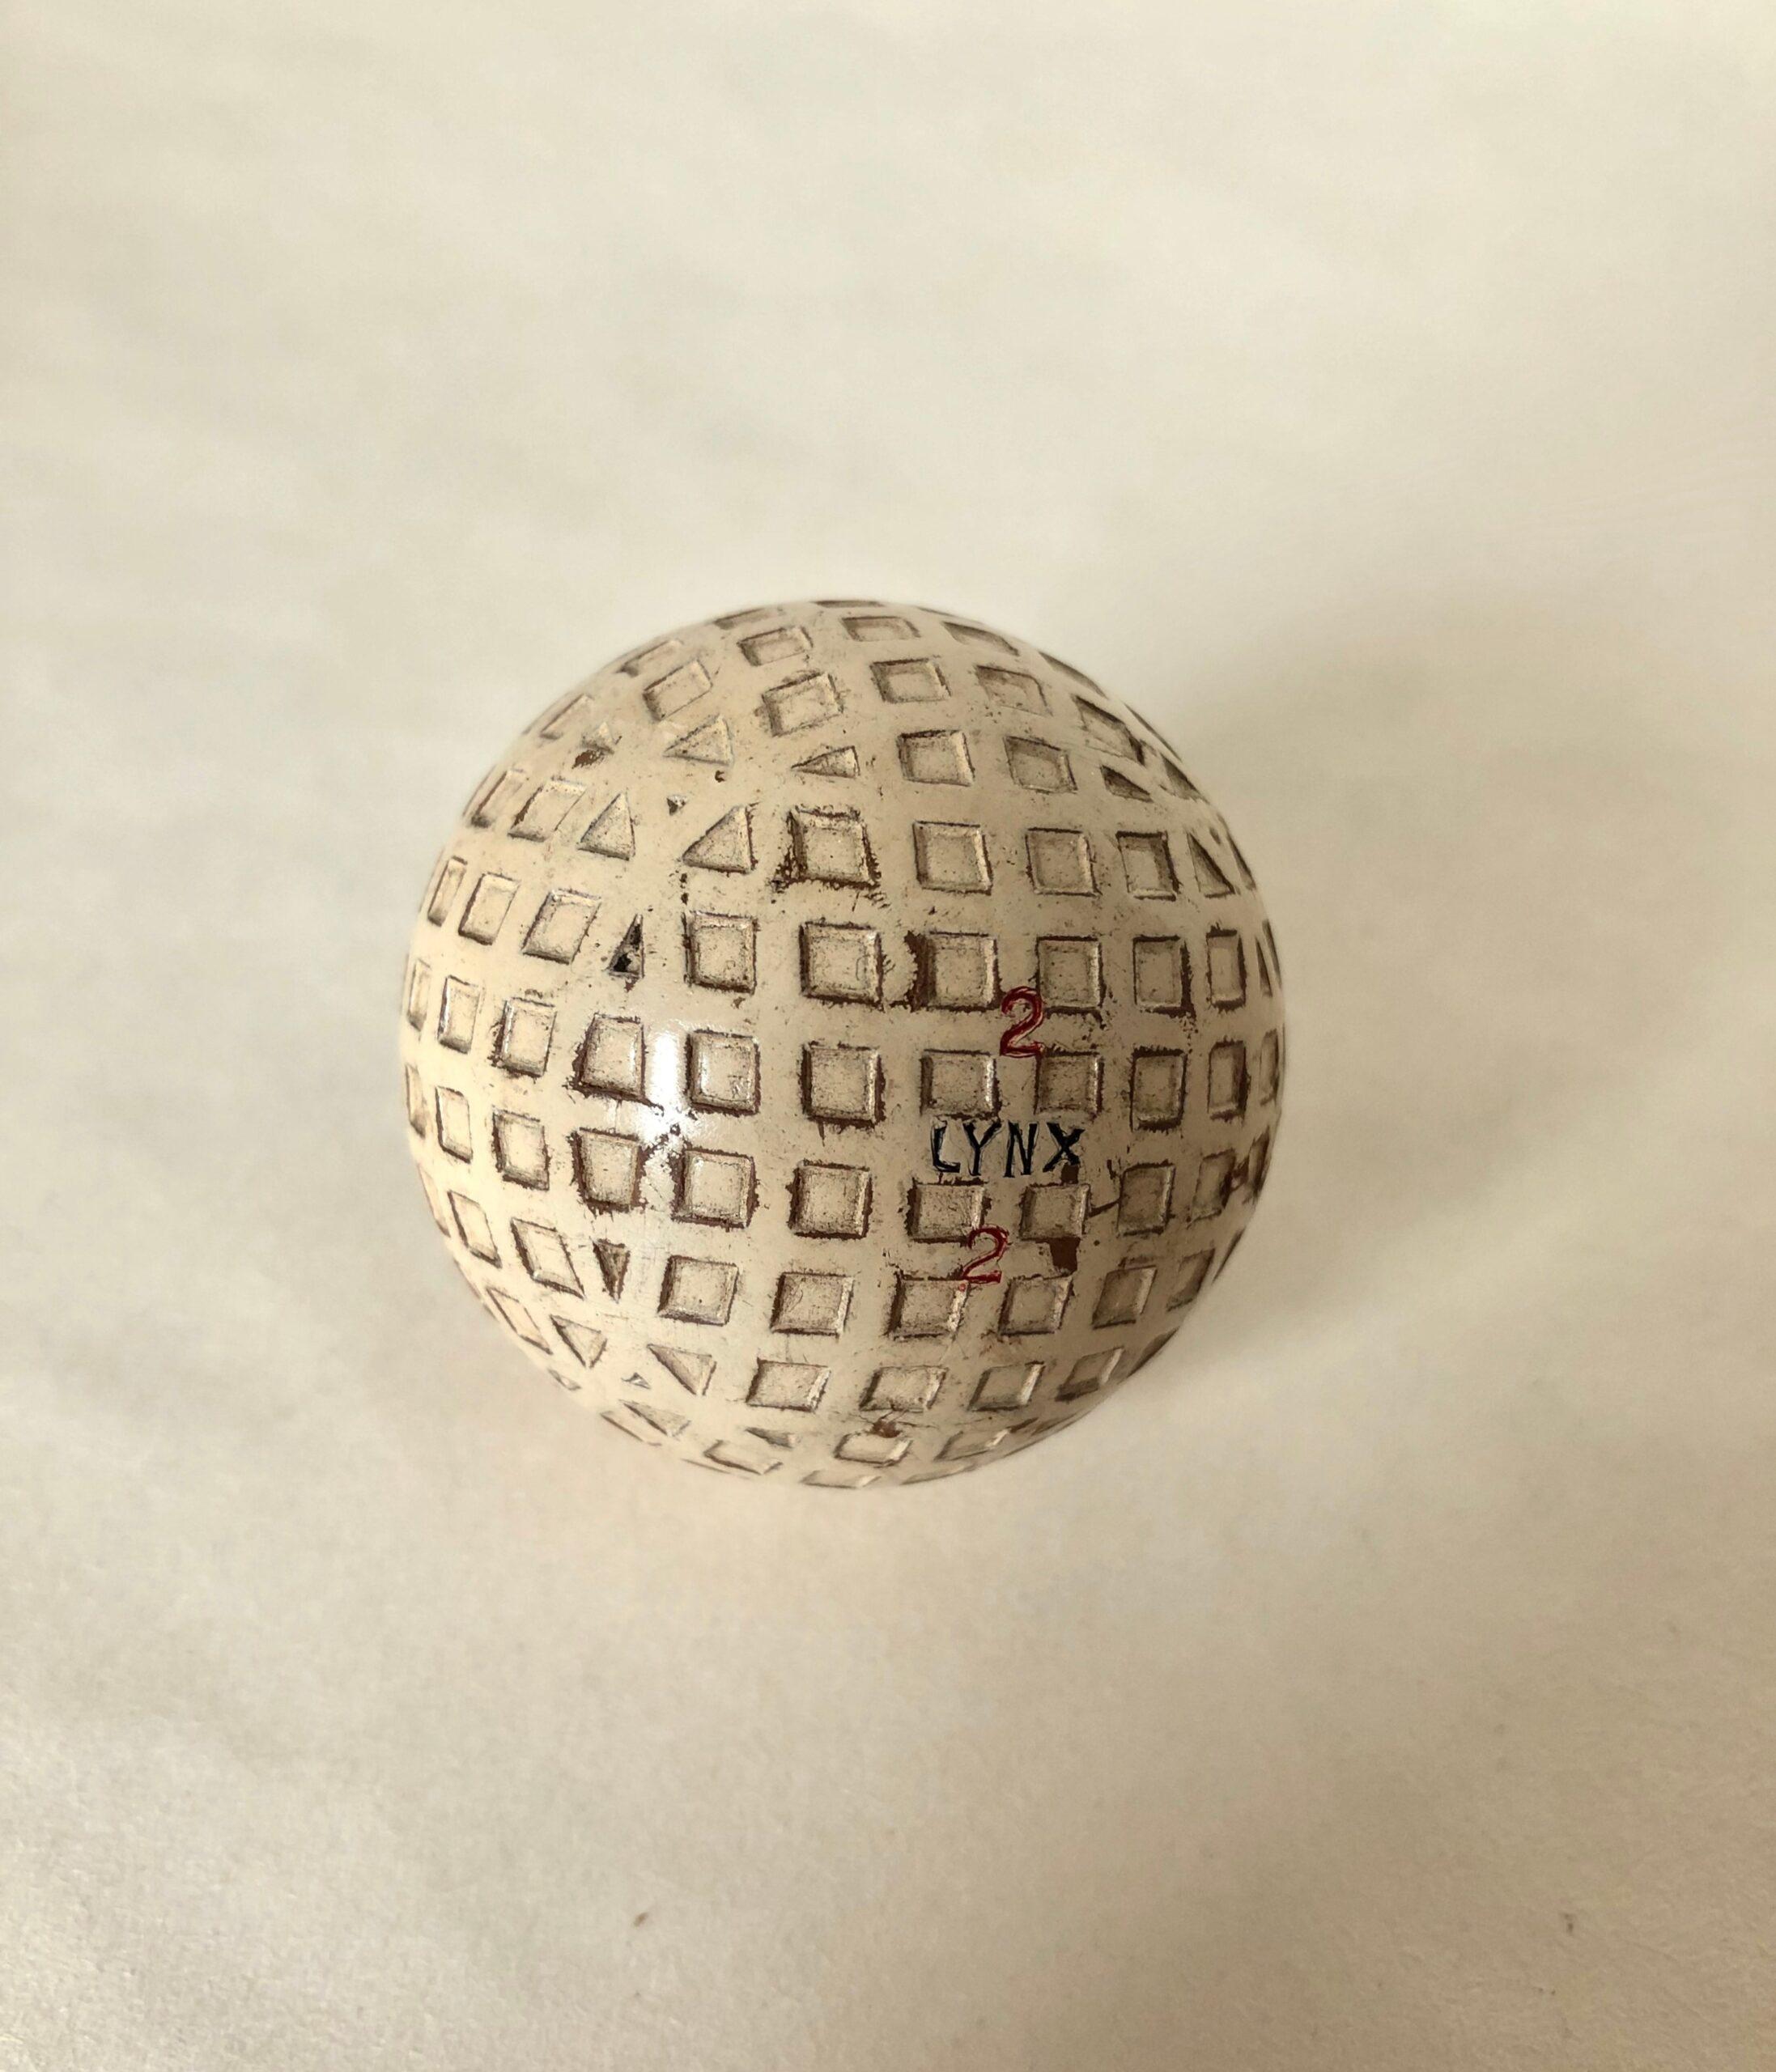 Silvertown 'Lynx' Golf Ball